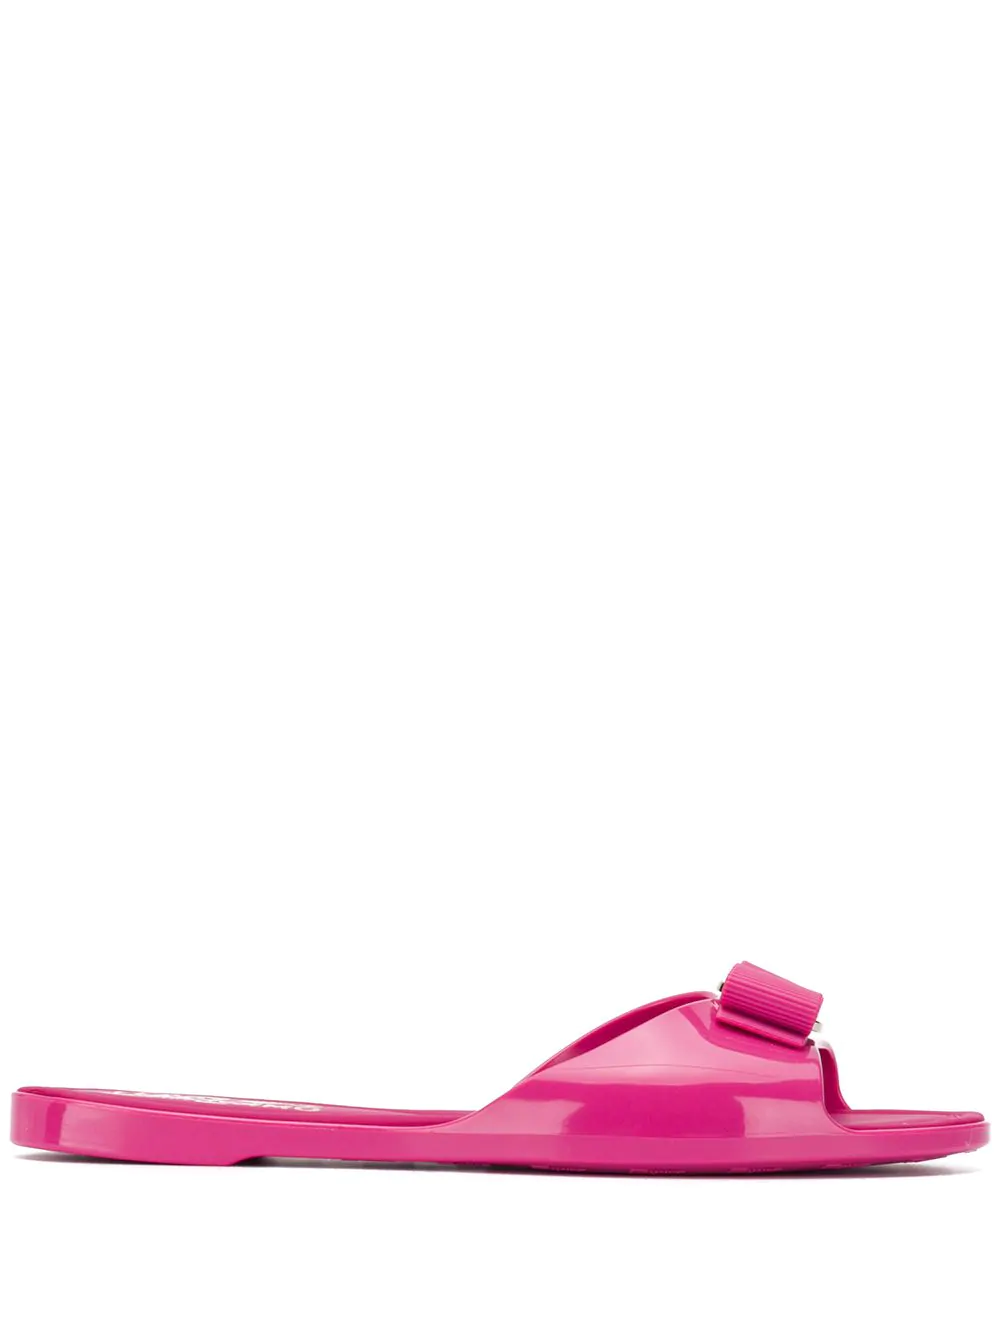 08ff985d7b7 Salvatore Ferragamo Cirella Flat Pvc Jelly Bow Slide Sandals